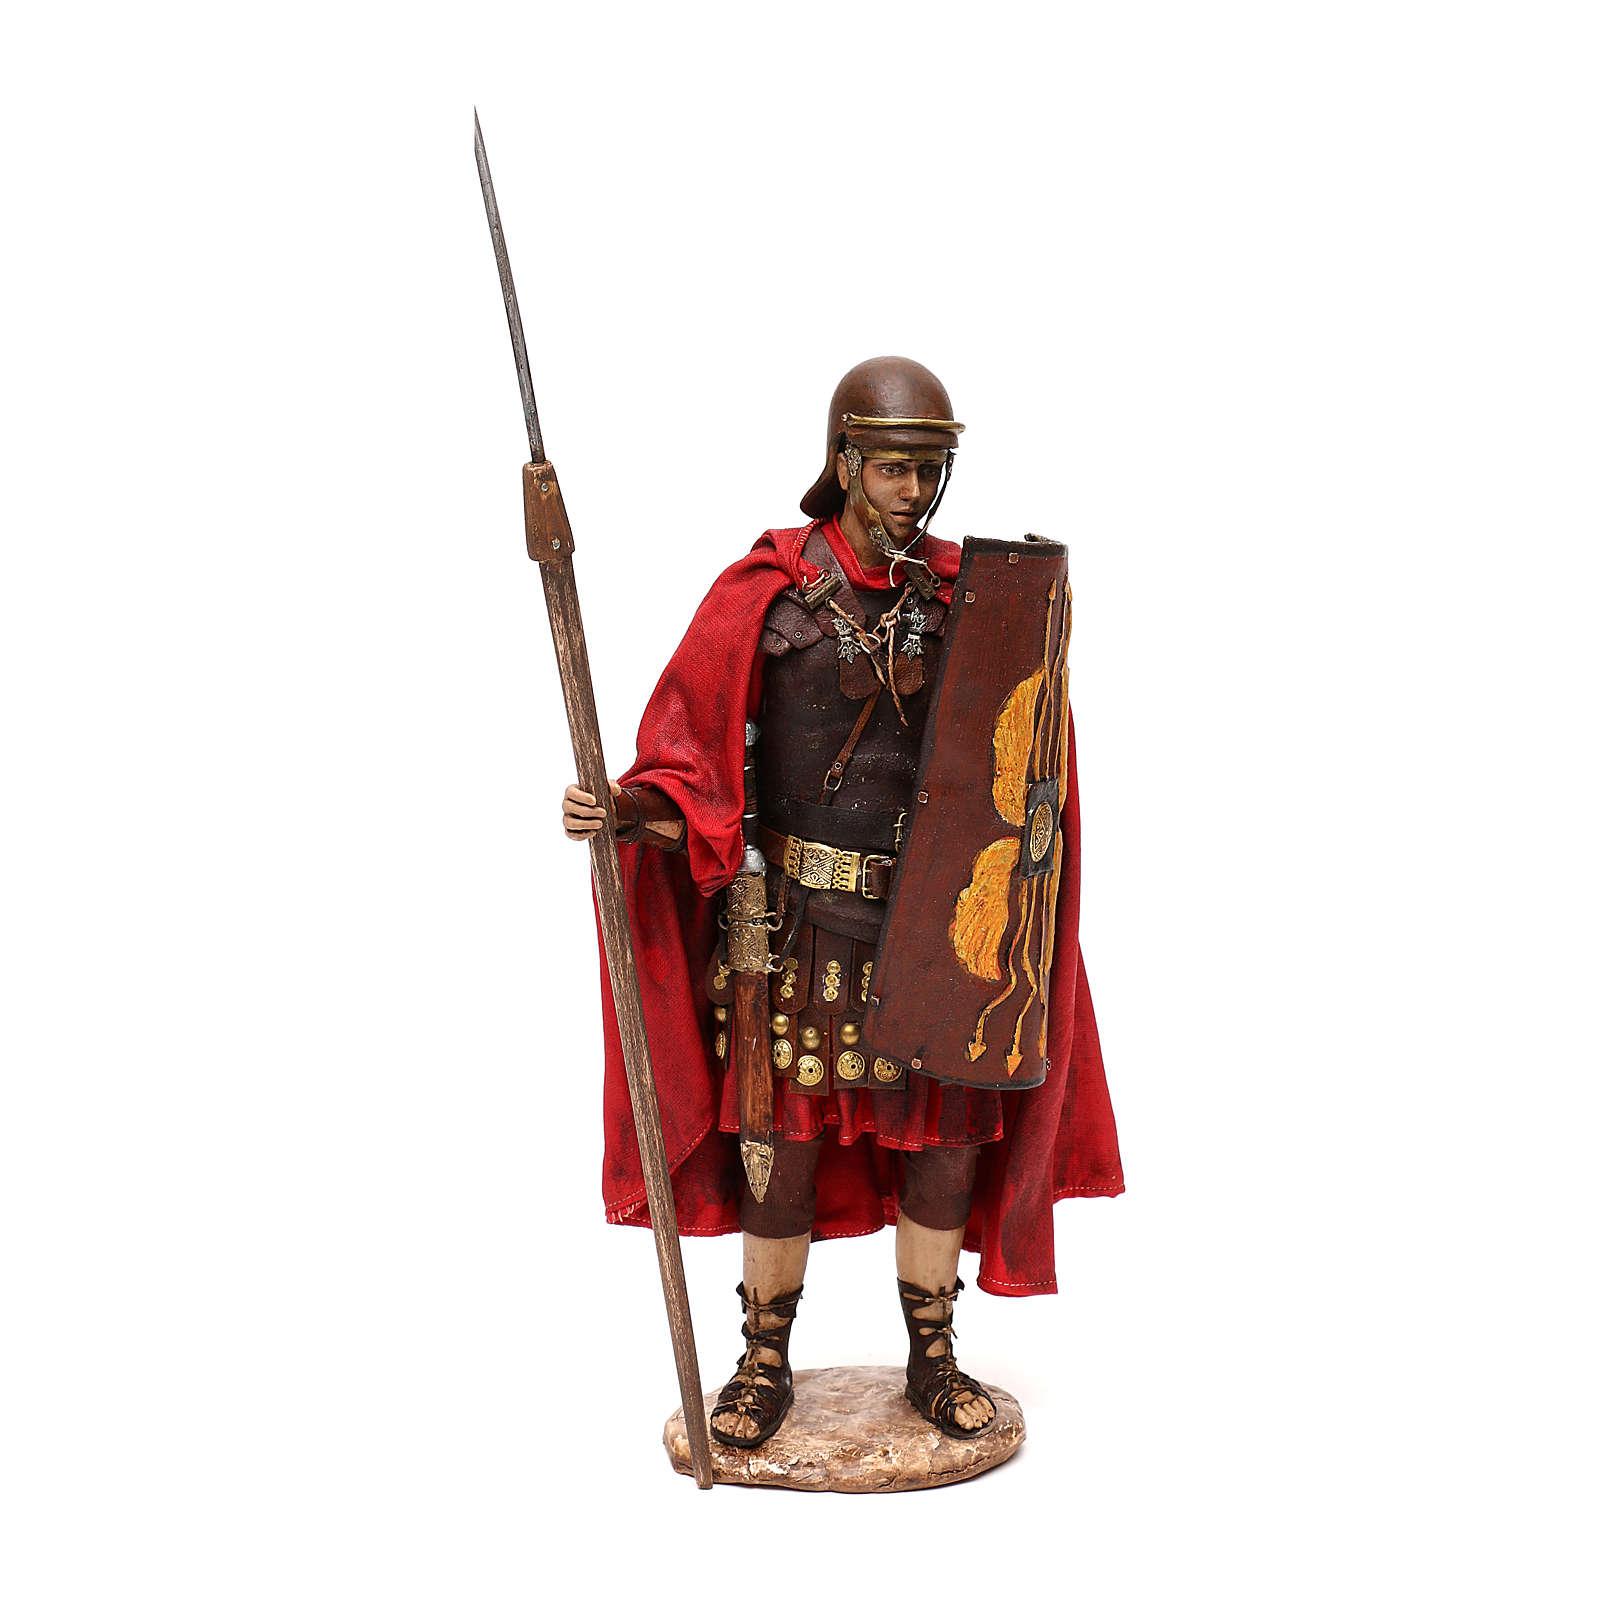 Soldato Romano presepe 30 cm atelier Tripi 4